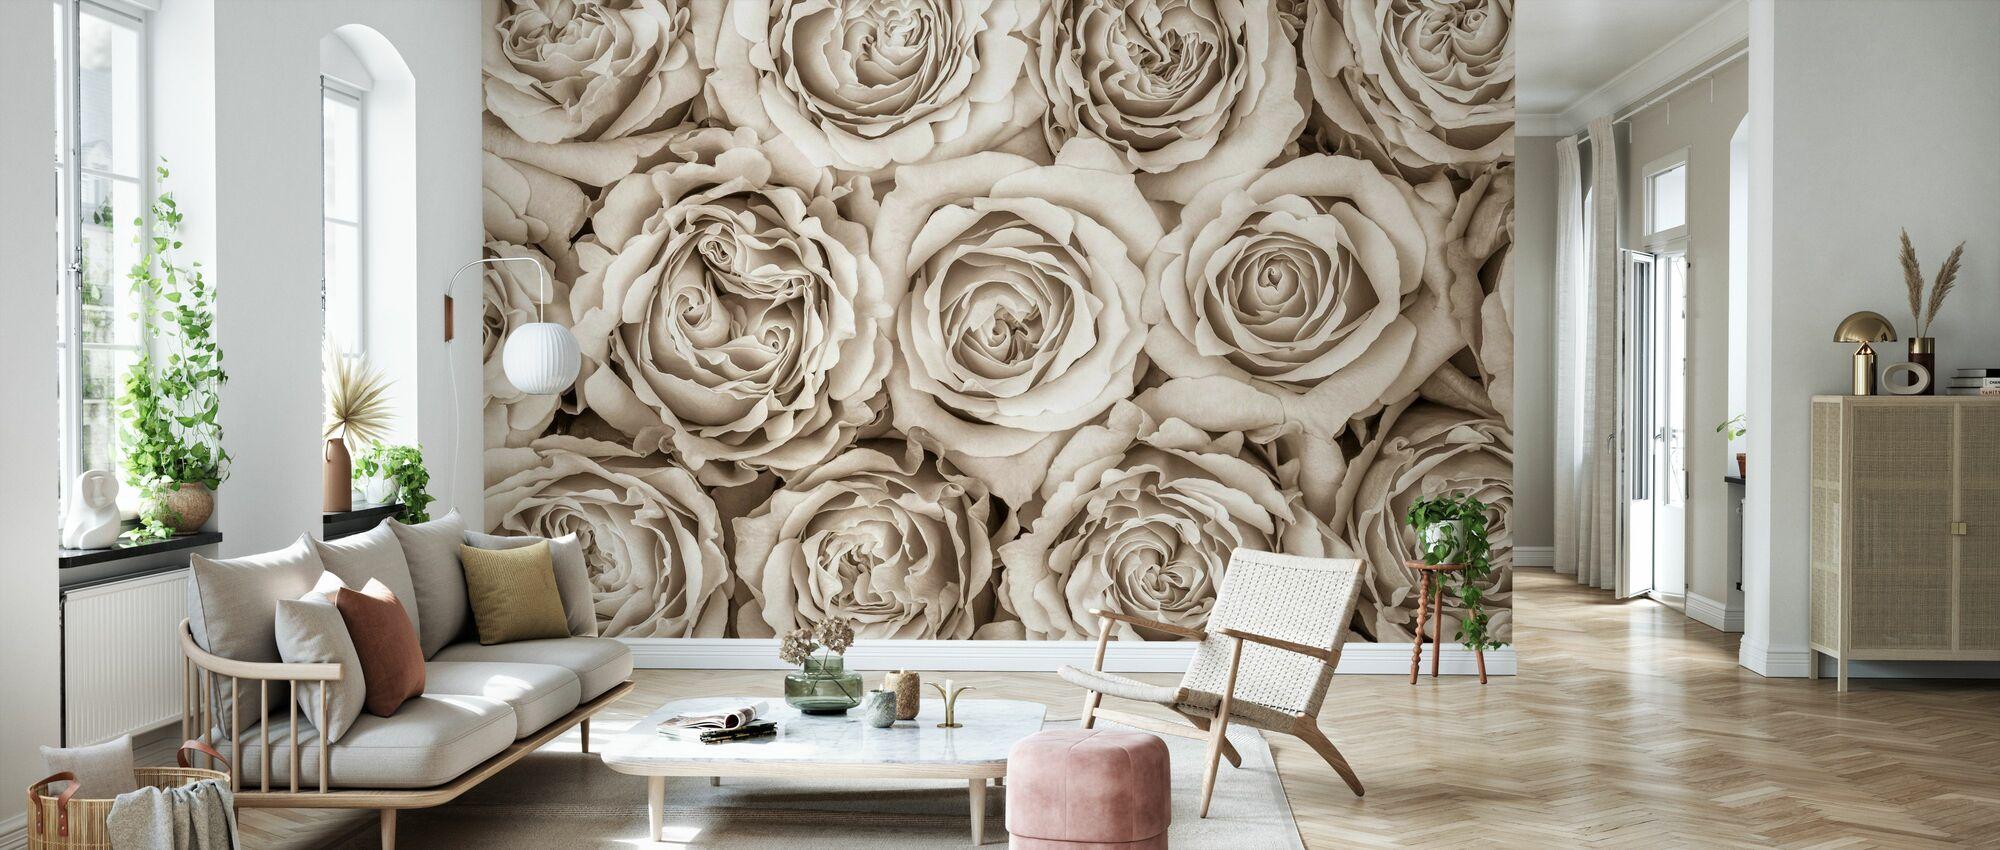 Roses - Sepia - Wallpaper - Living Room